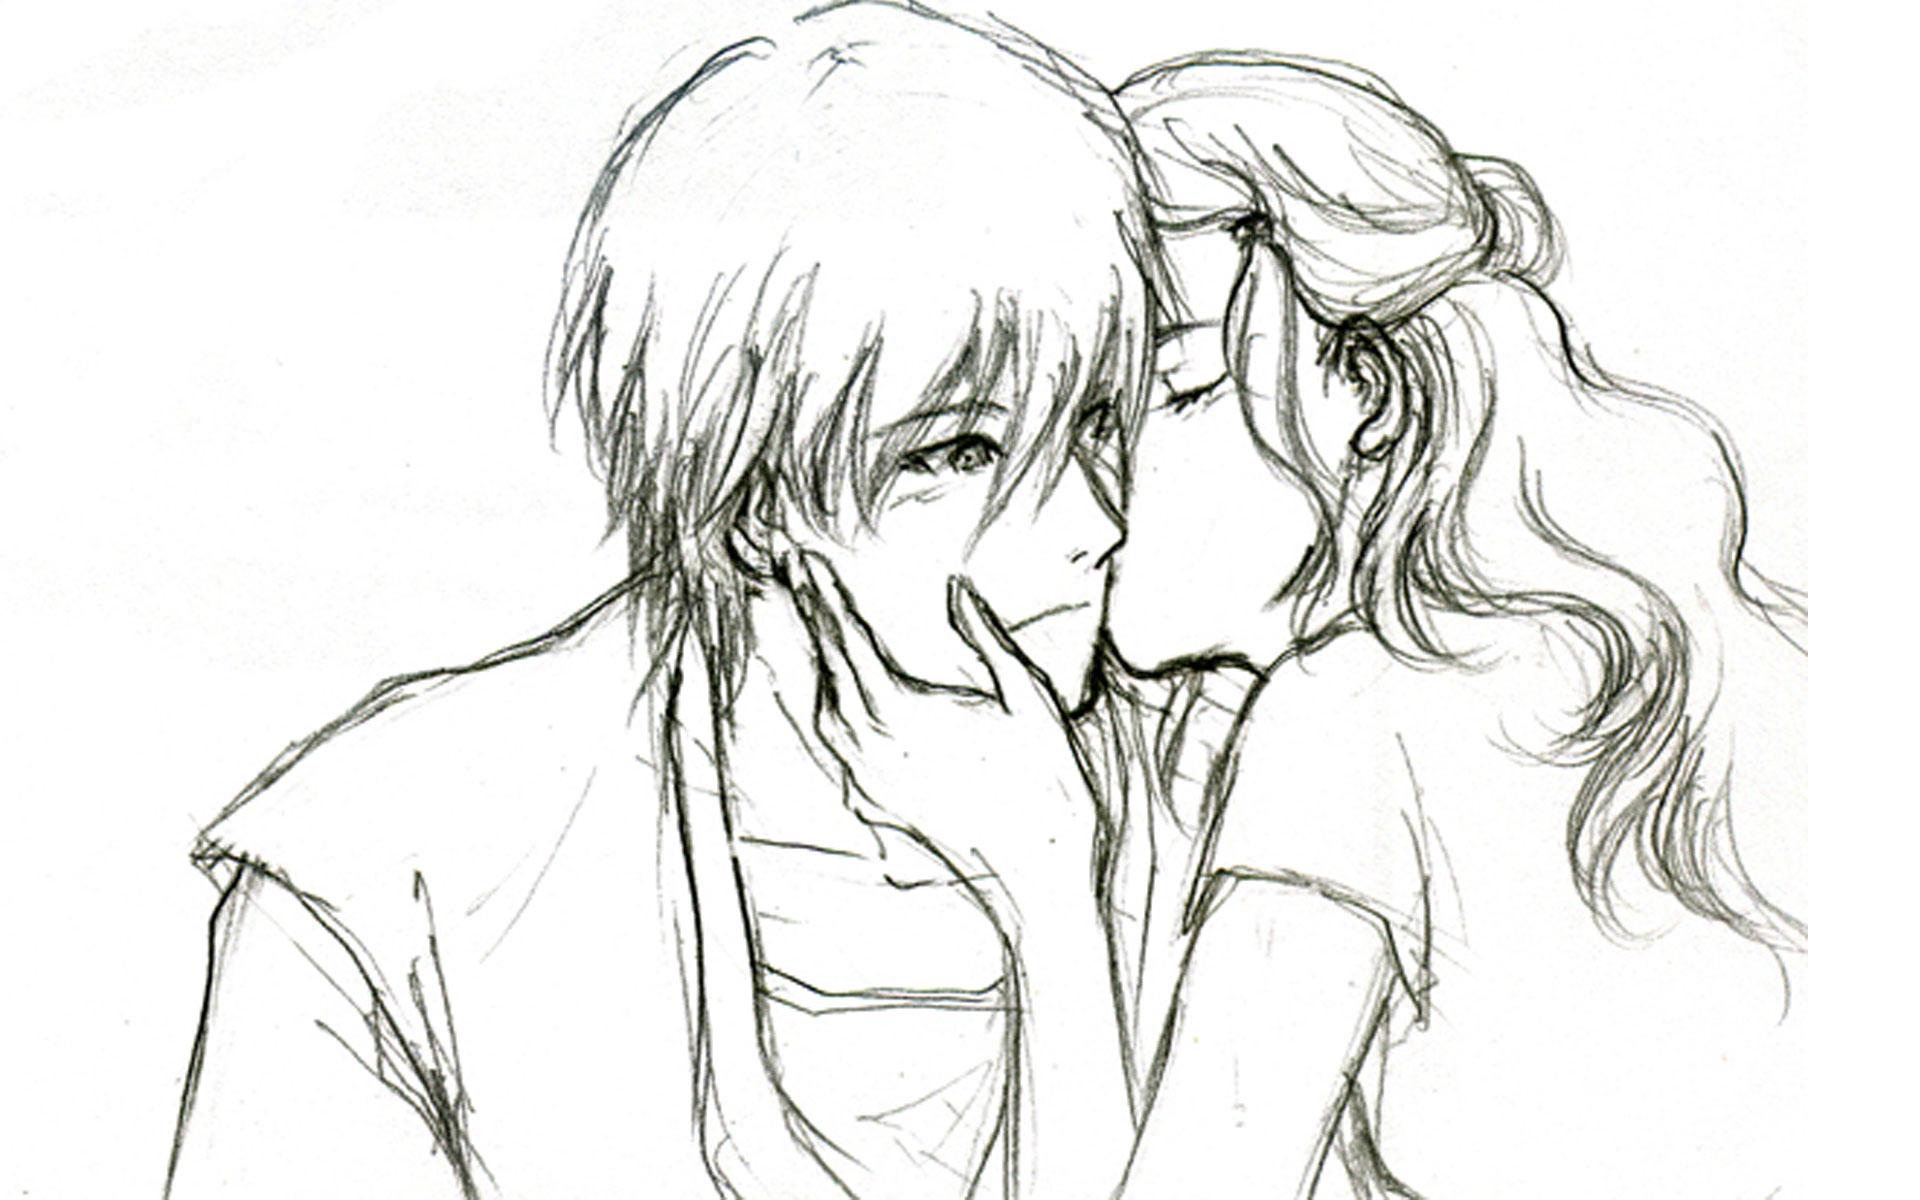 1920x1200 Romance Art Pencil Drawings Easy Easy Pencil Drawings Of Love